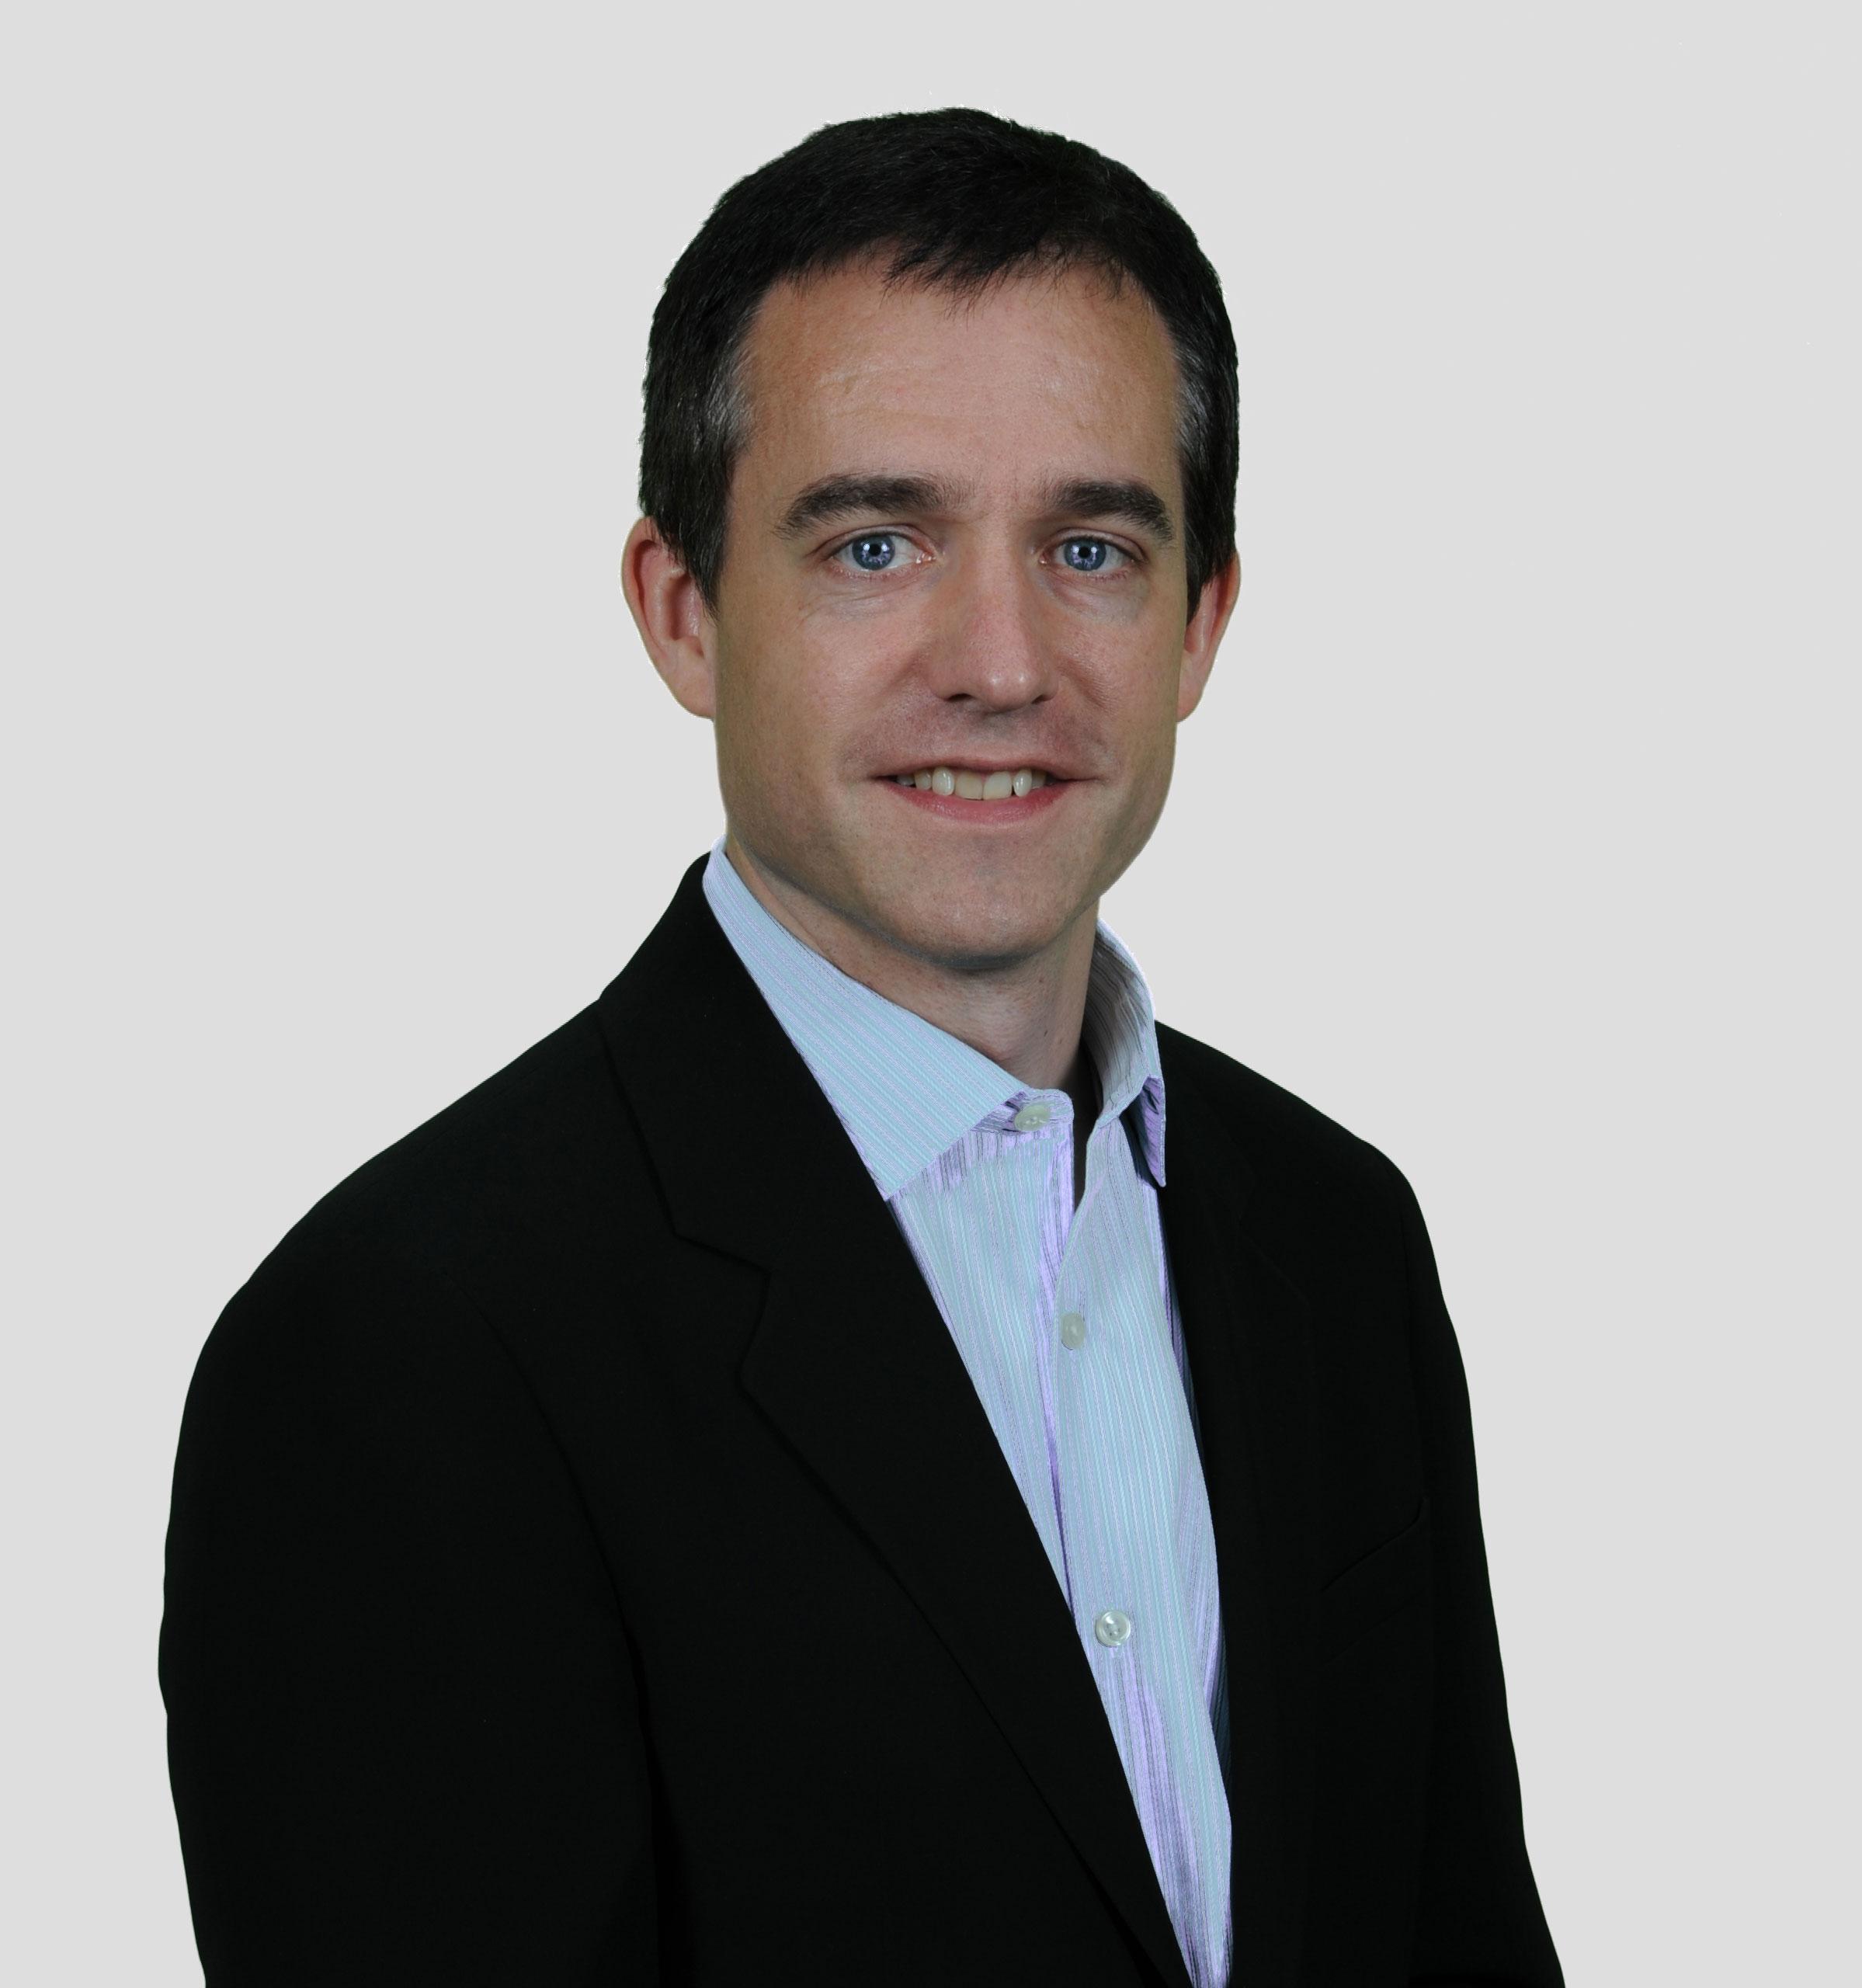 Stephen McGerty